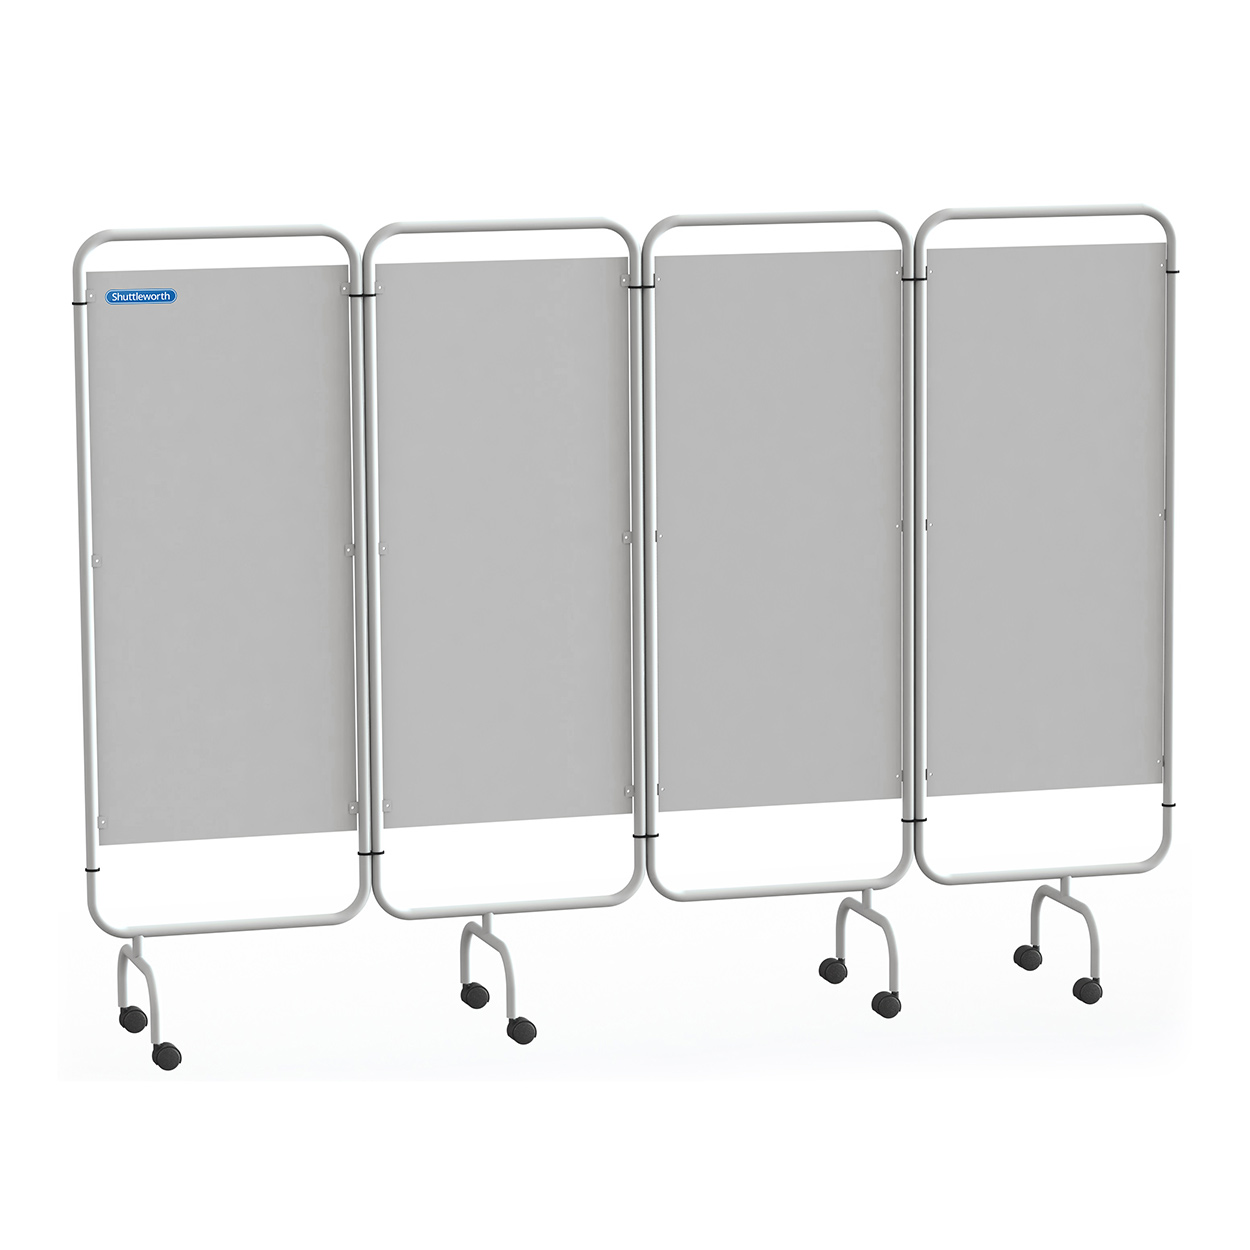 4 panel ward screen